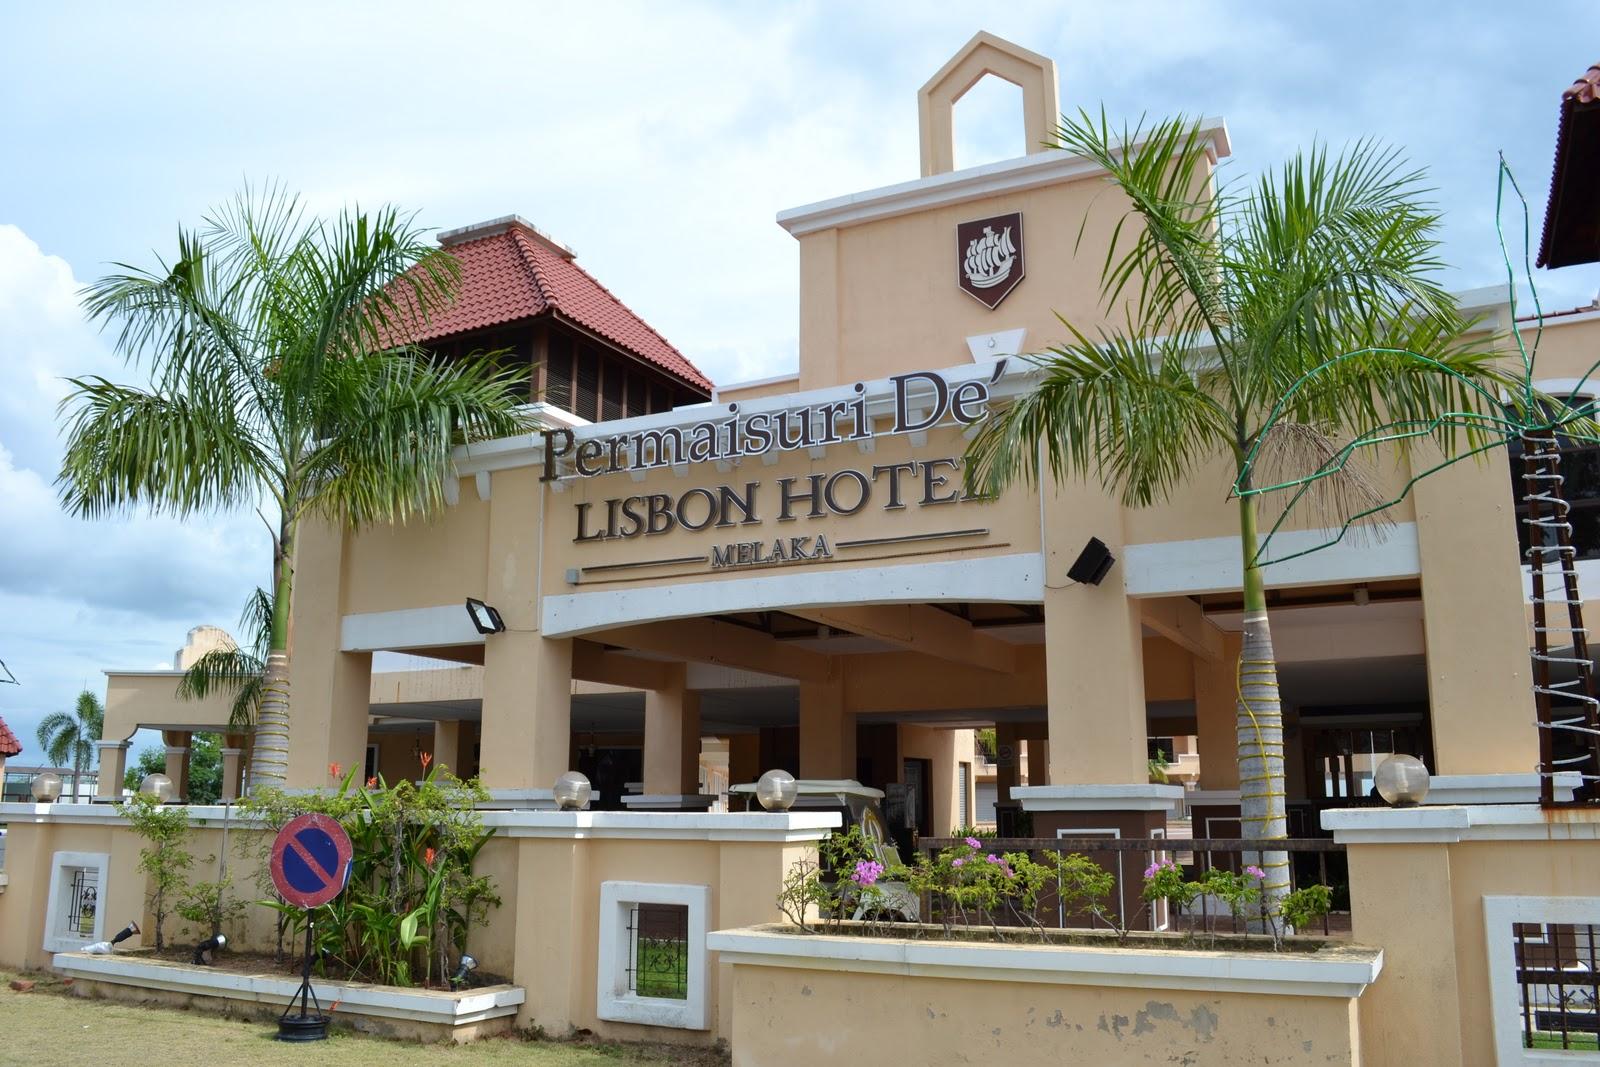 Petang Pukul 600 Ptg Baru Kami Sampai Ke Pemaisuri De Lisbon Hotel Melaka Itu Pun Setelah Beberapa Kali Berpusing Pusing Di Sekitar Bandar Hilir